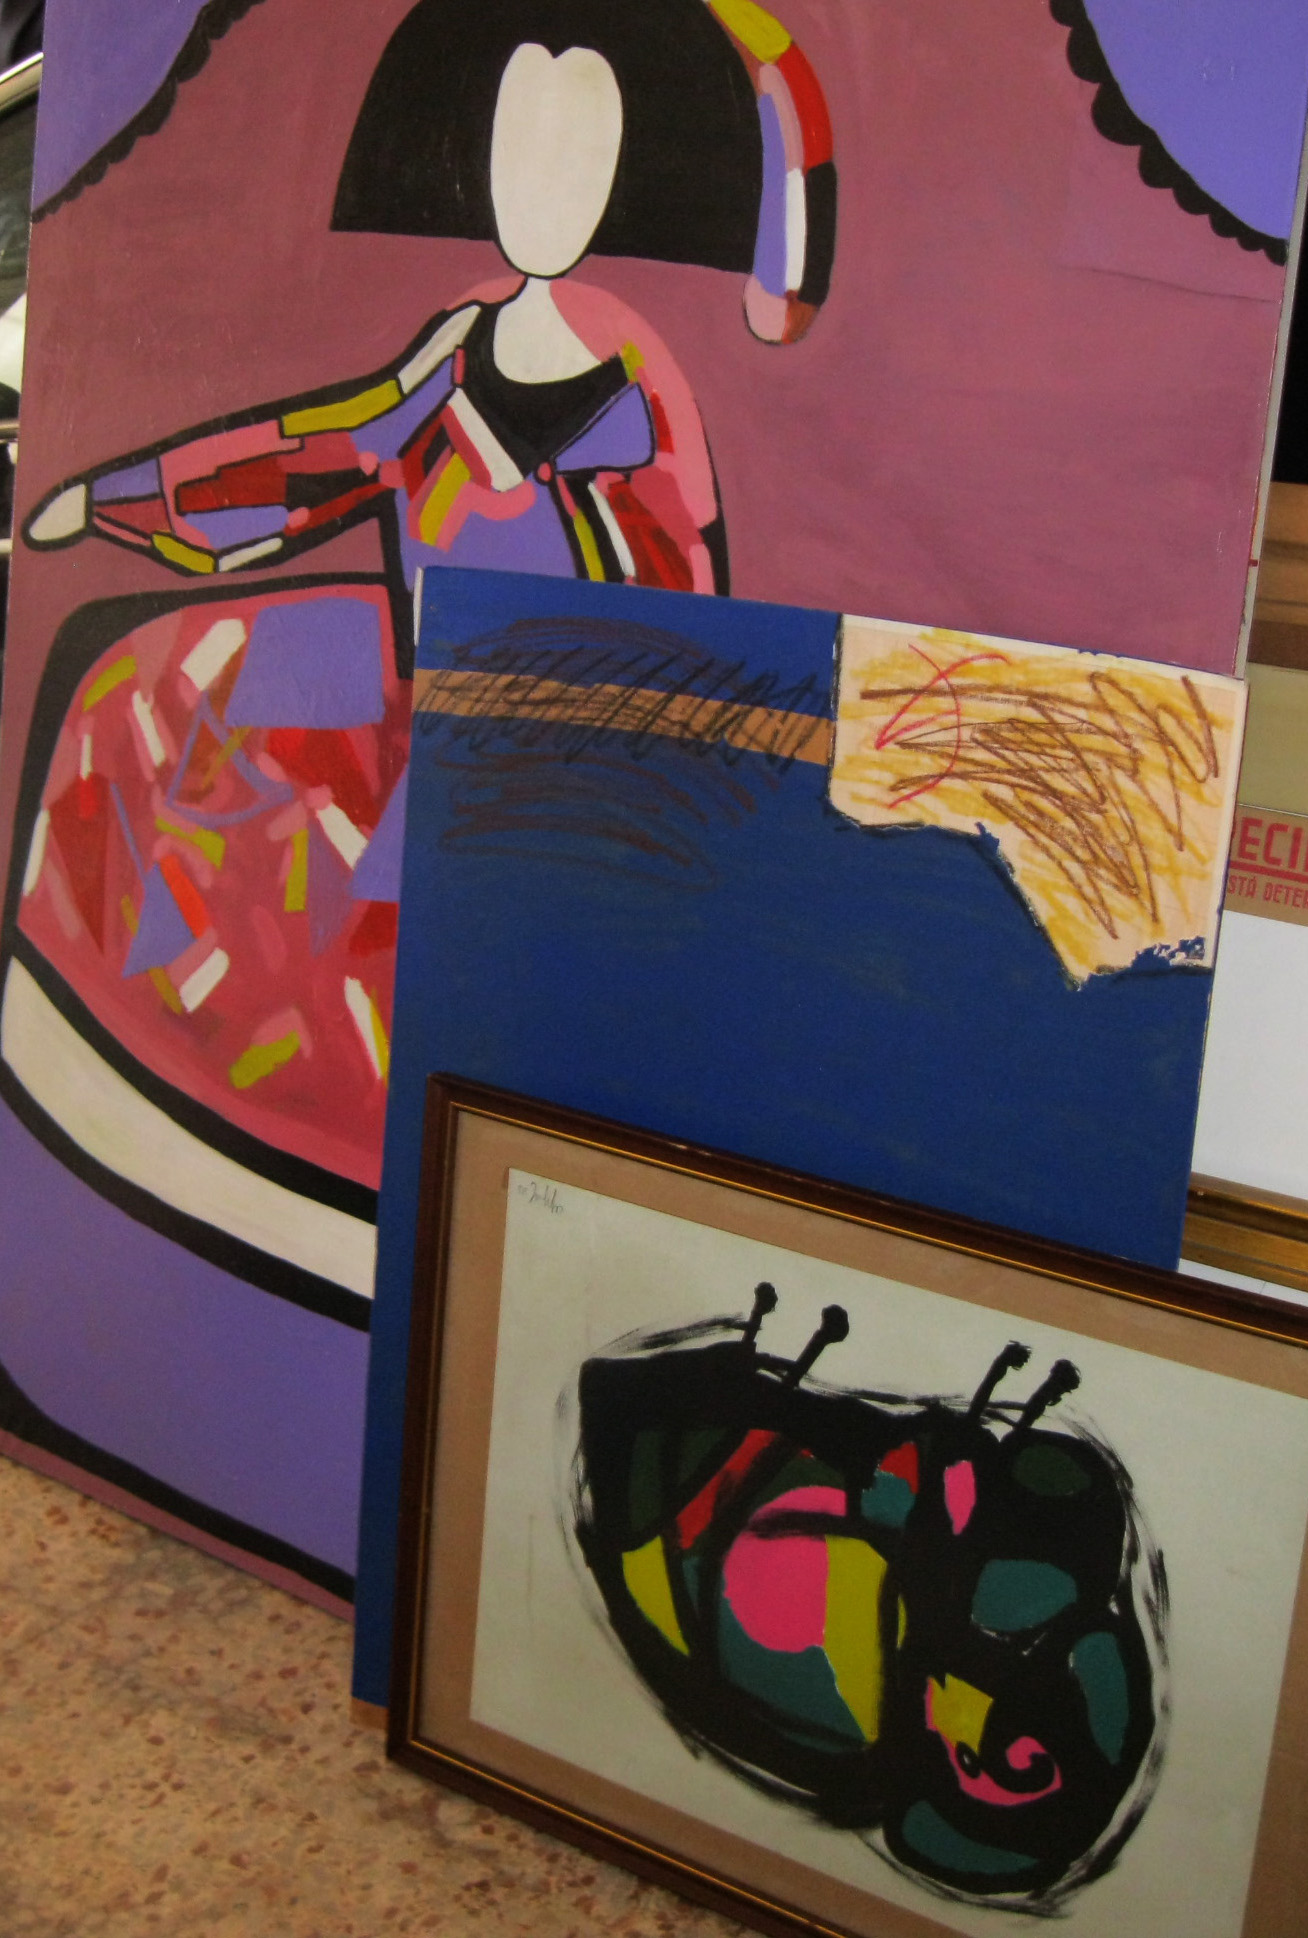 Spanish police arrest 9 on suspicion of selling fake art